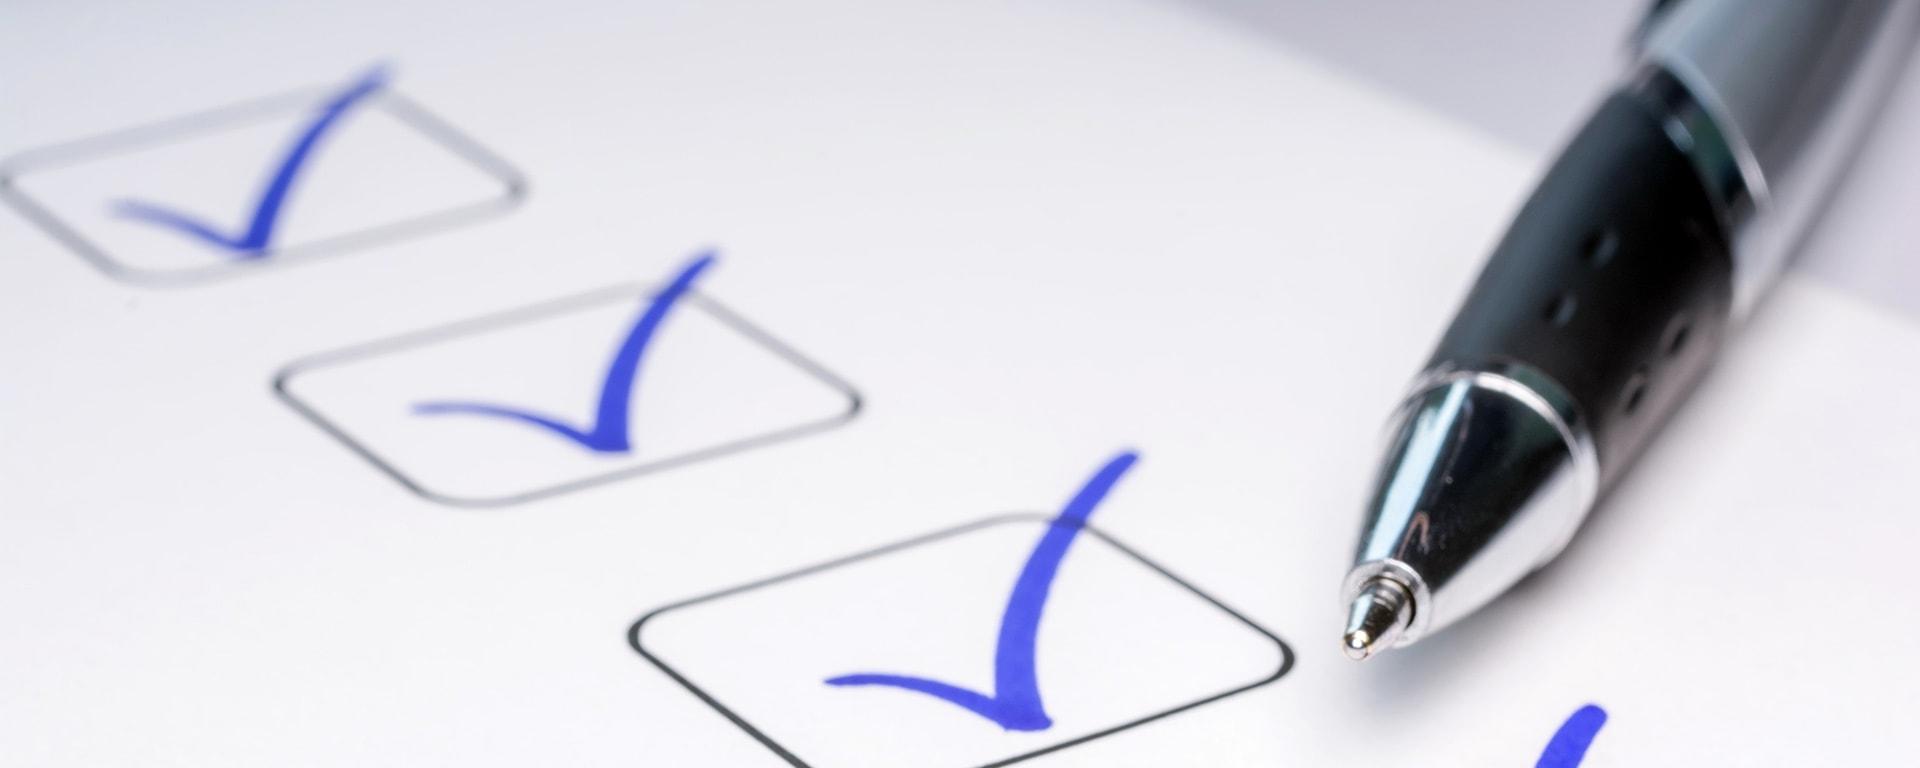 Successful quality management blog checklist image